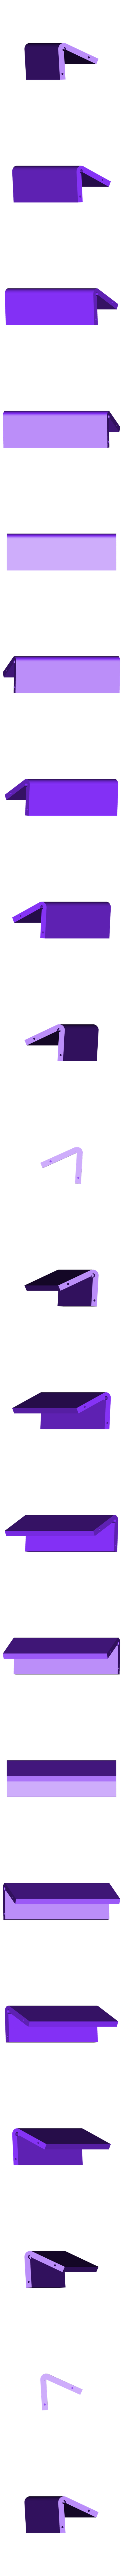 Front Bumper.stl Download STL file RC Speed Tank • 3D printable design, Bryant